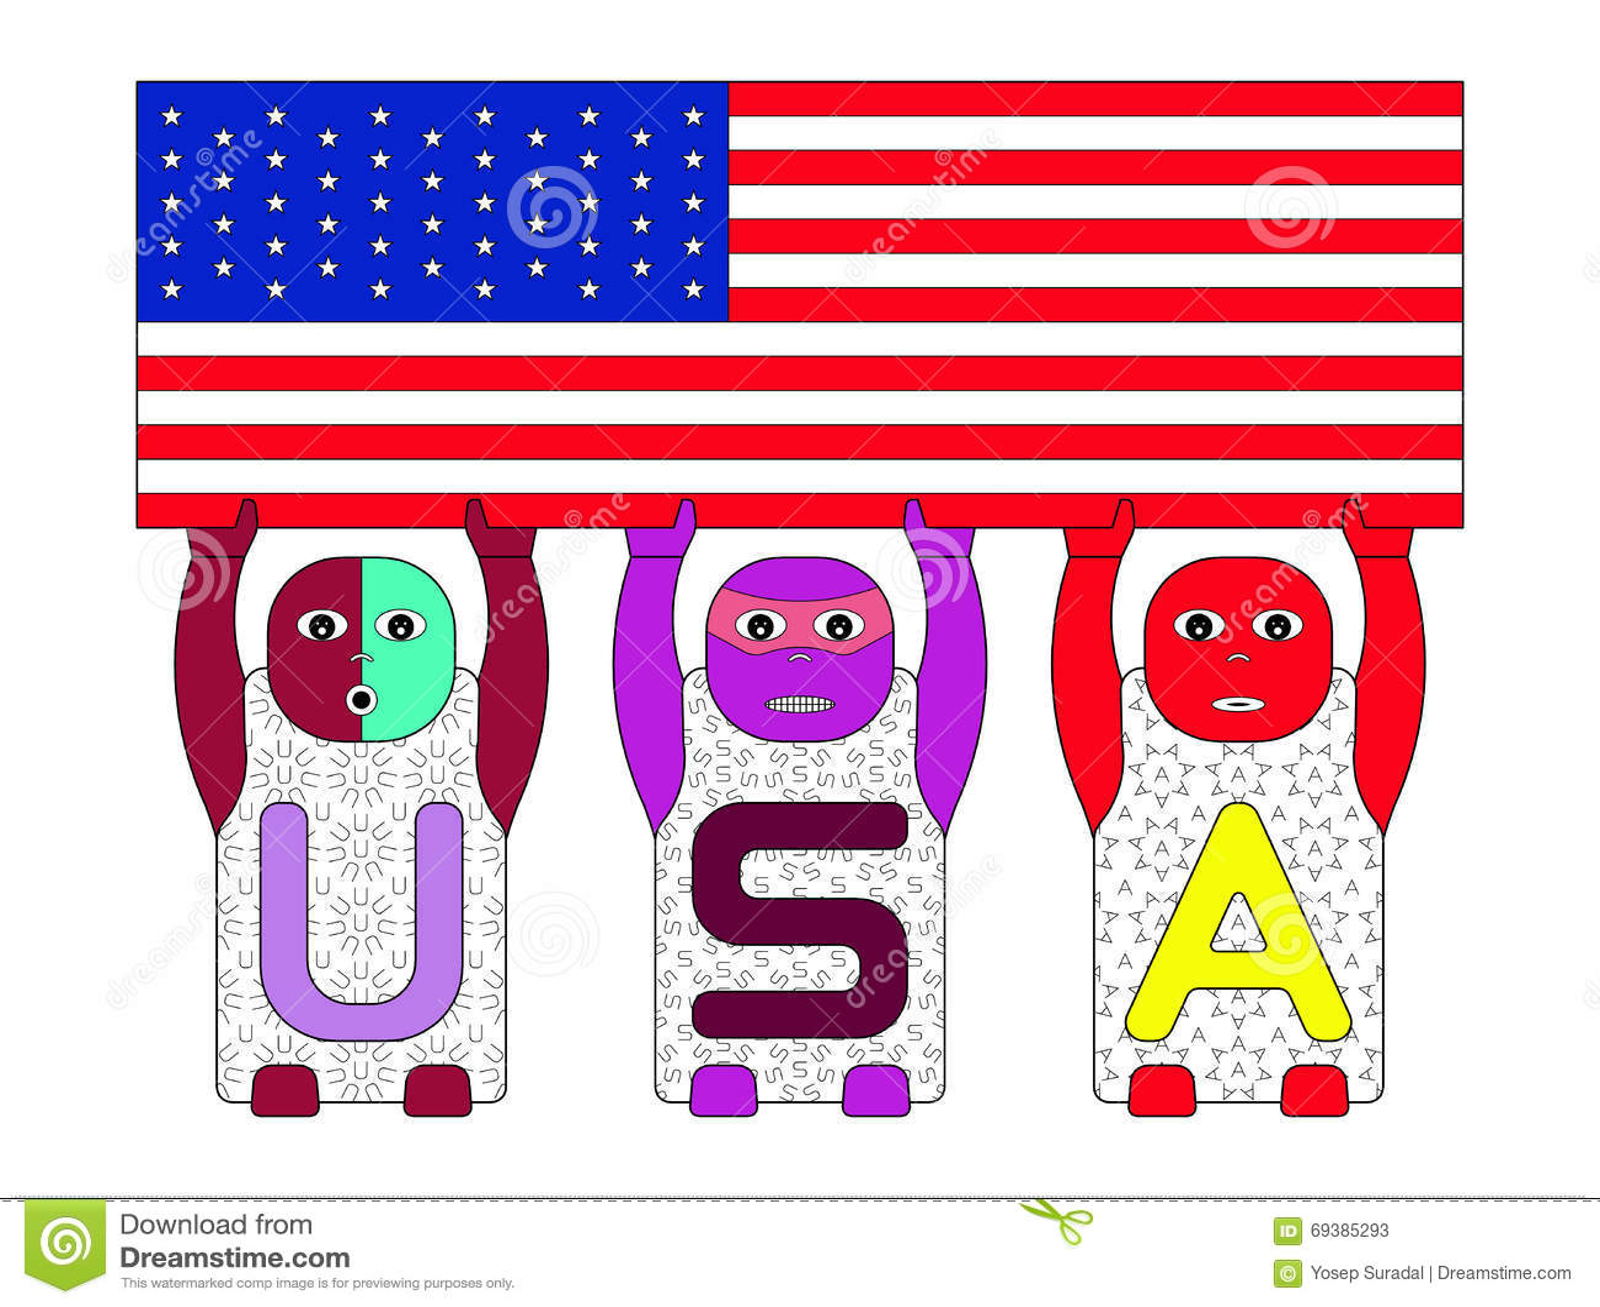 alphabetical children s s u s a lifting us flag on white alphabetical children s s u s a lifting us flag on white background